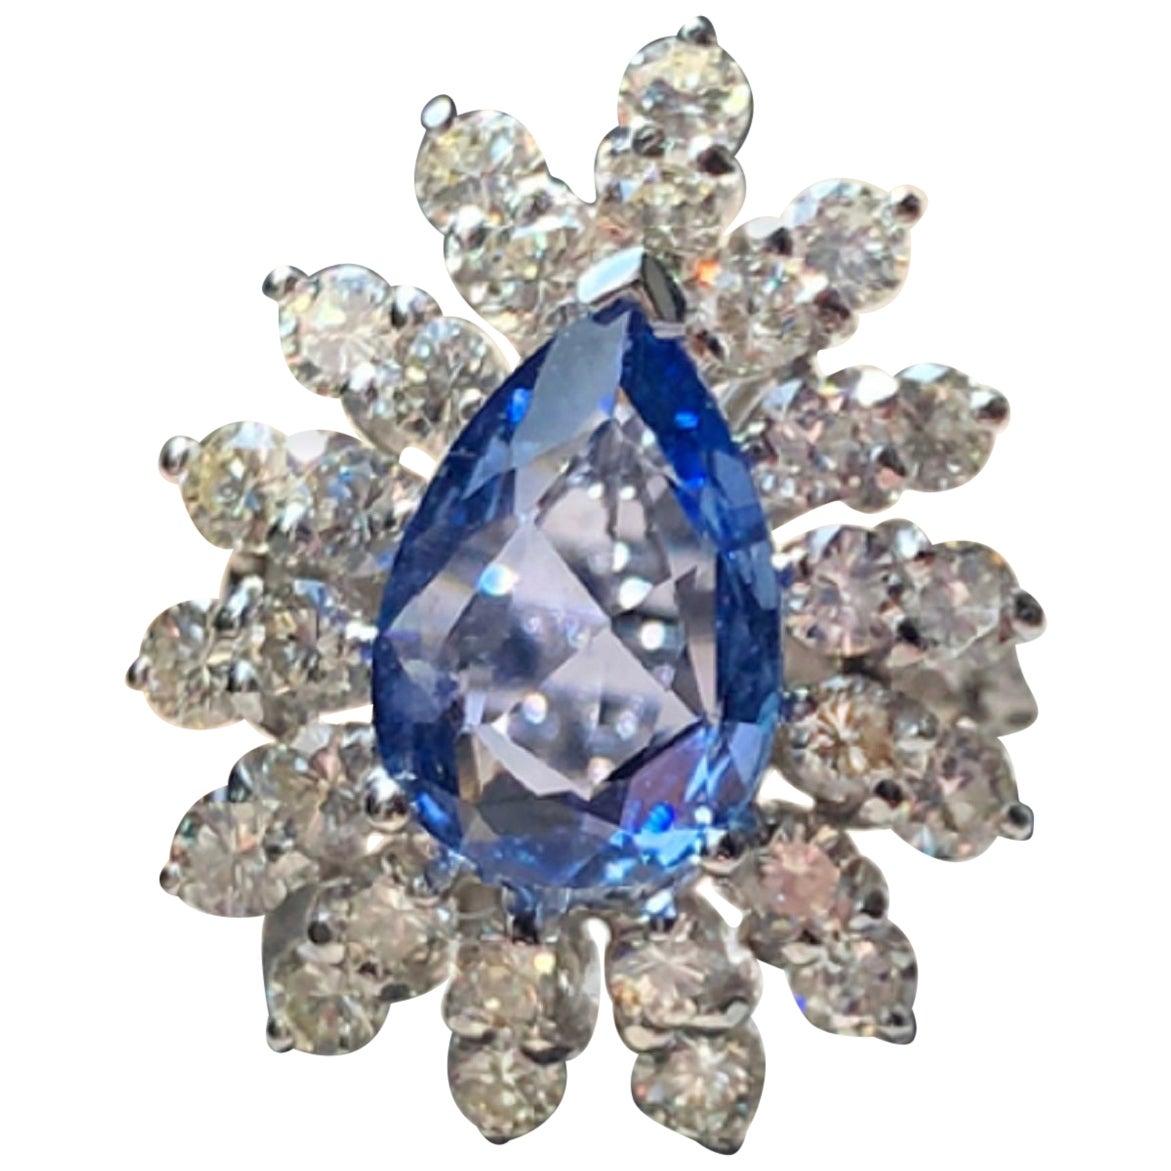 4.80 Carat Cornflower Sapphire and Diamond Cocktail Ring